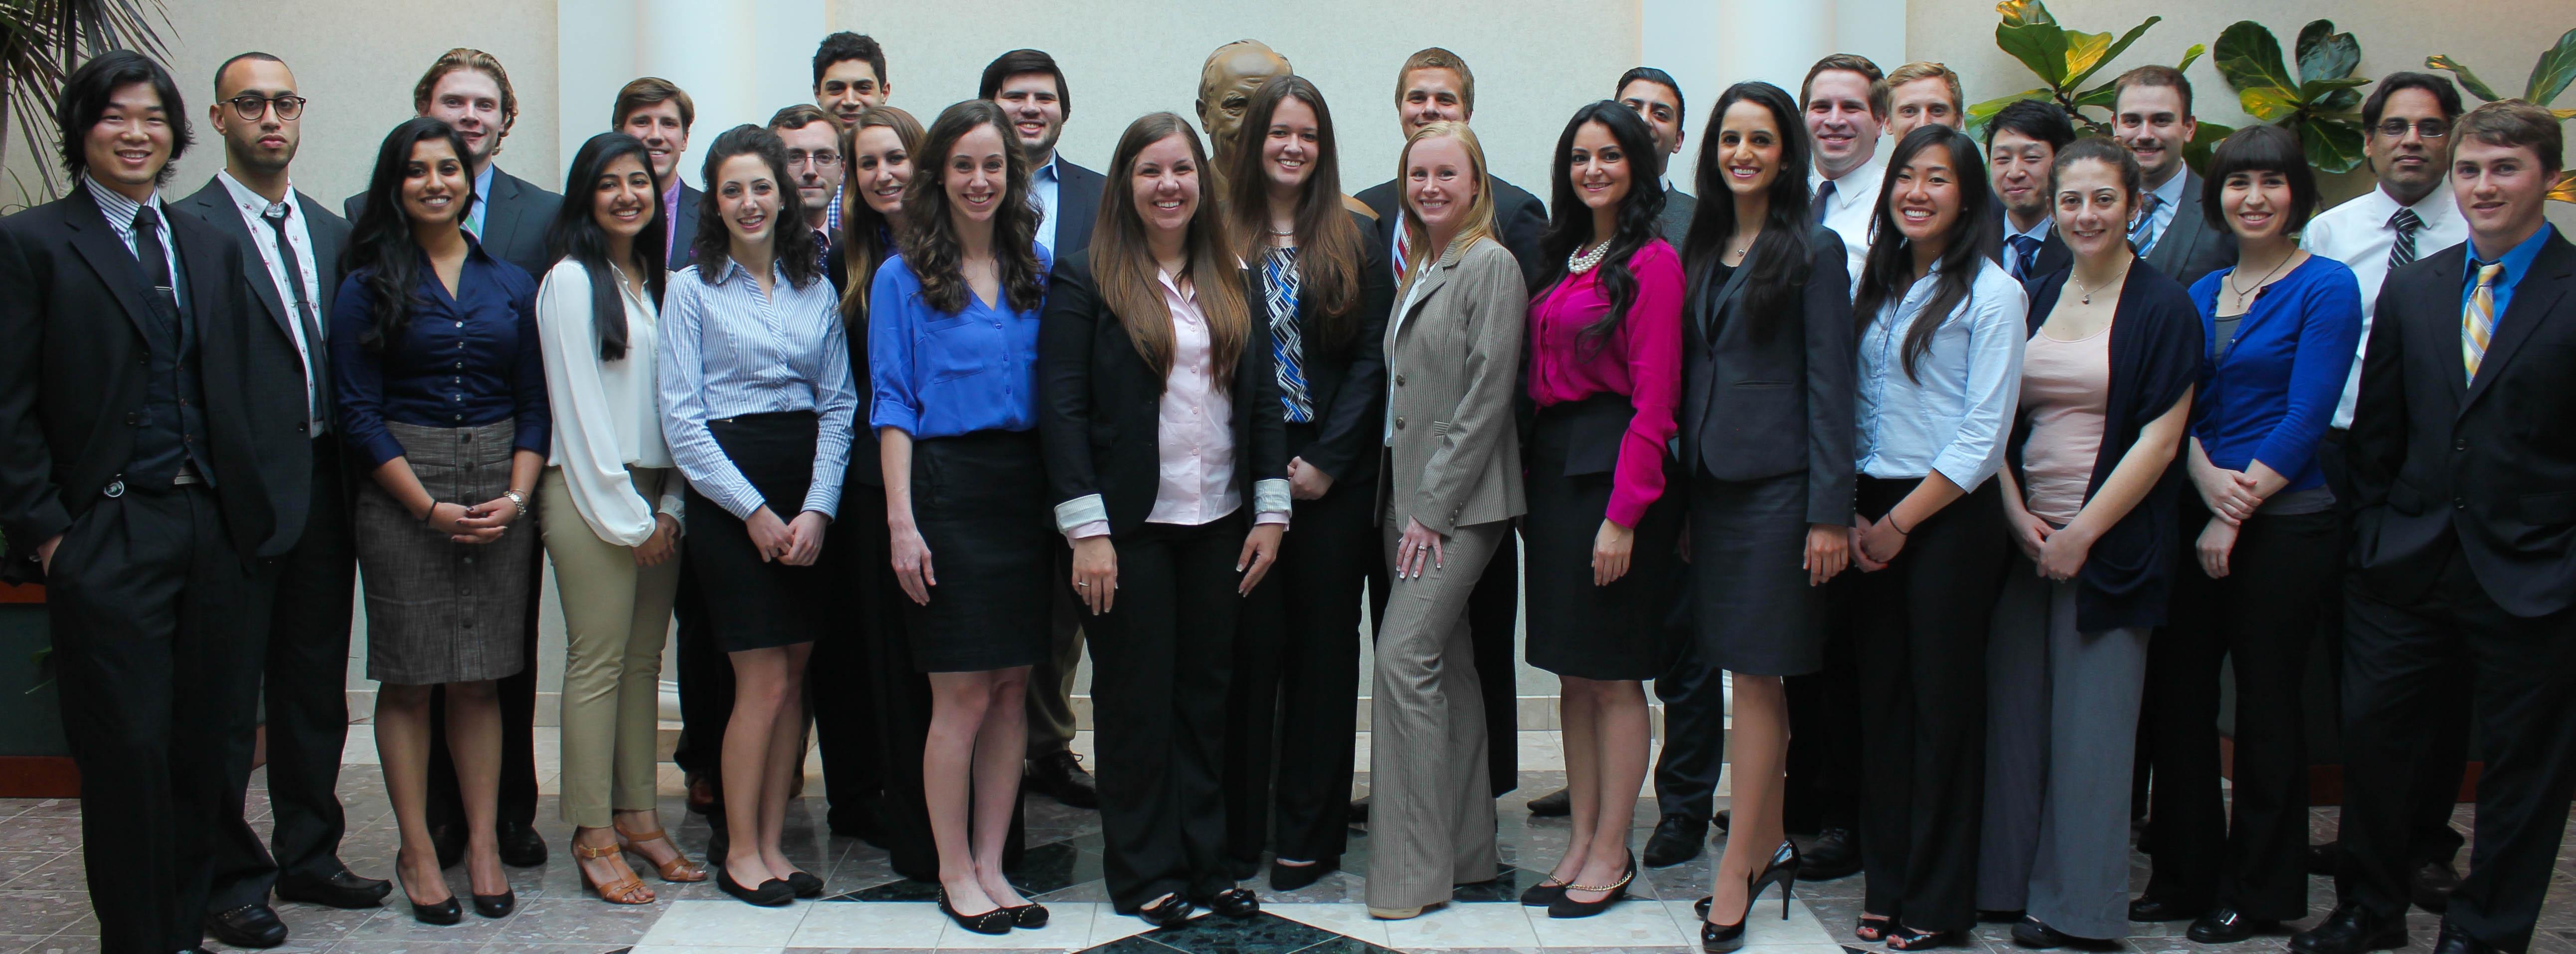 Editorial Staff 2014-2015